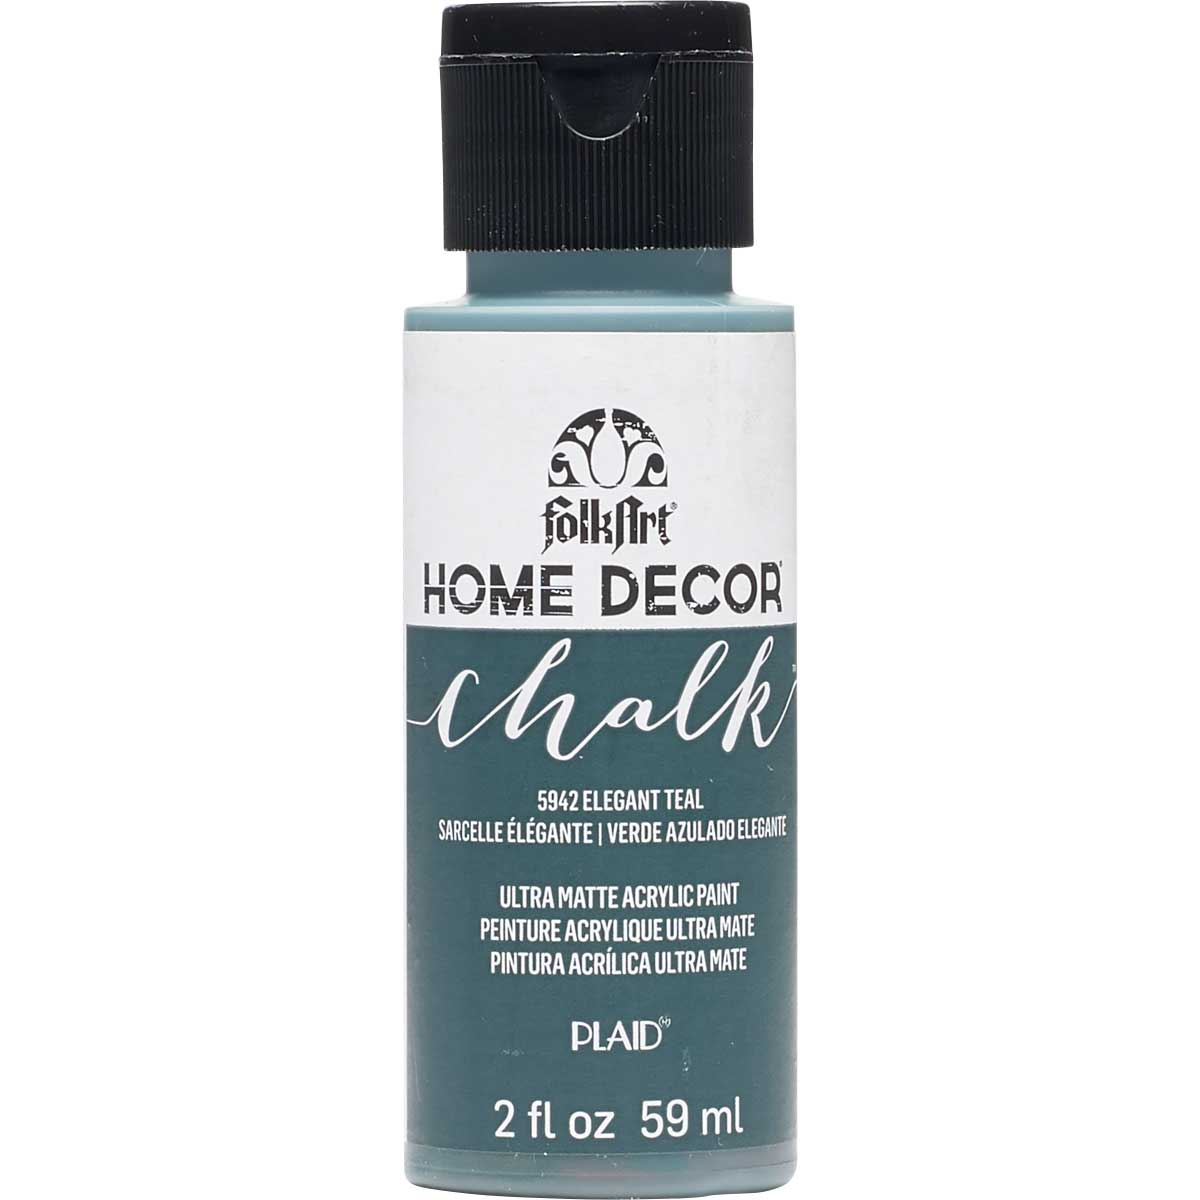 FolkArt ® Home Decor™ Chalk - Elegant Teal, 2 oz. - 5942